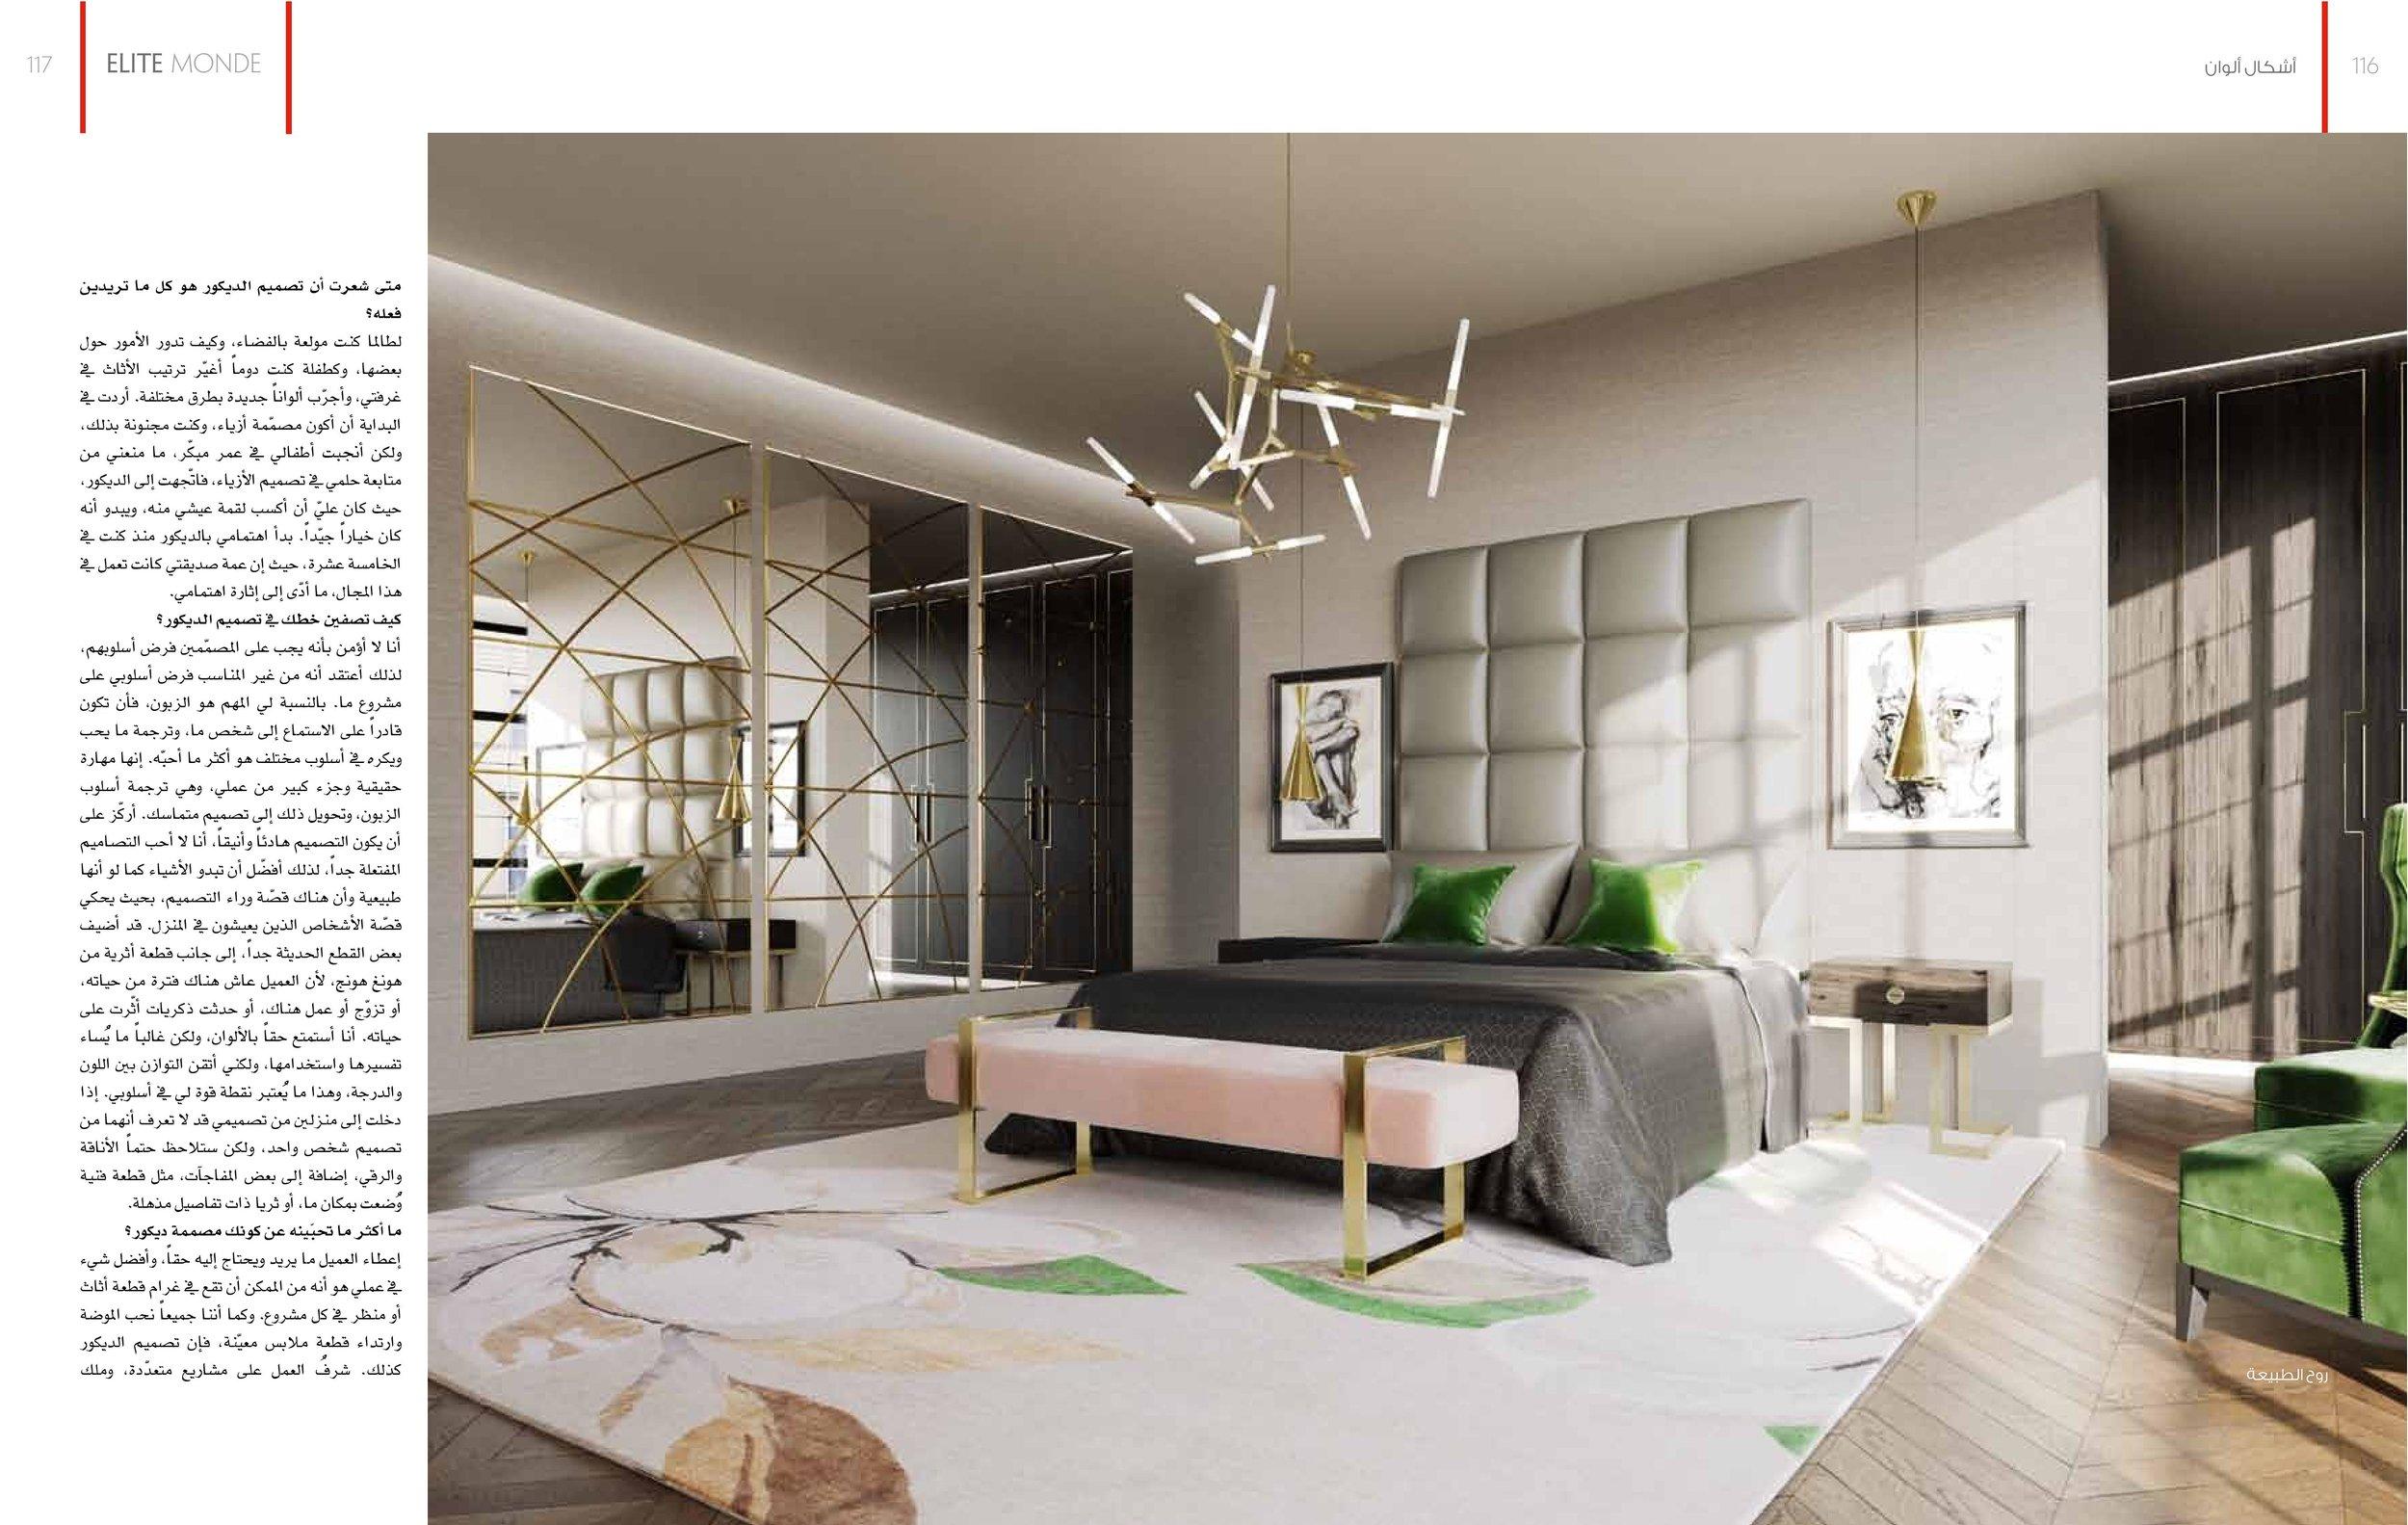 High-end London interior designer Jo Hamilton Elite Monde pages four and five